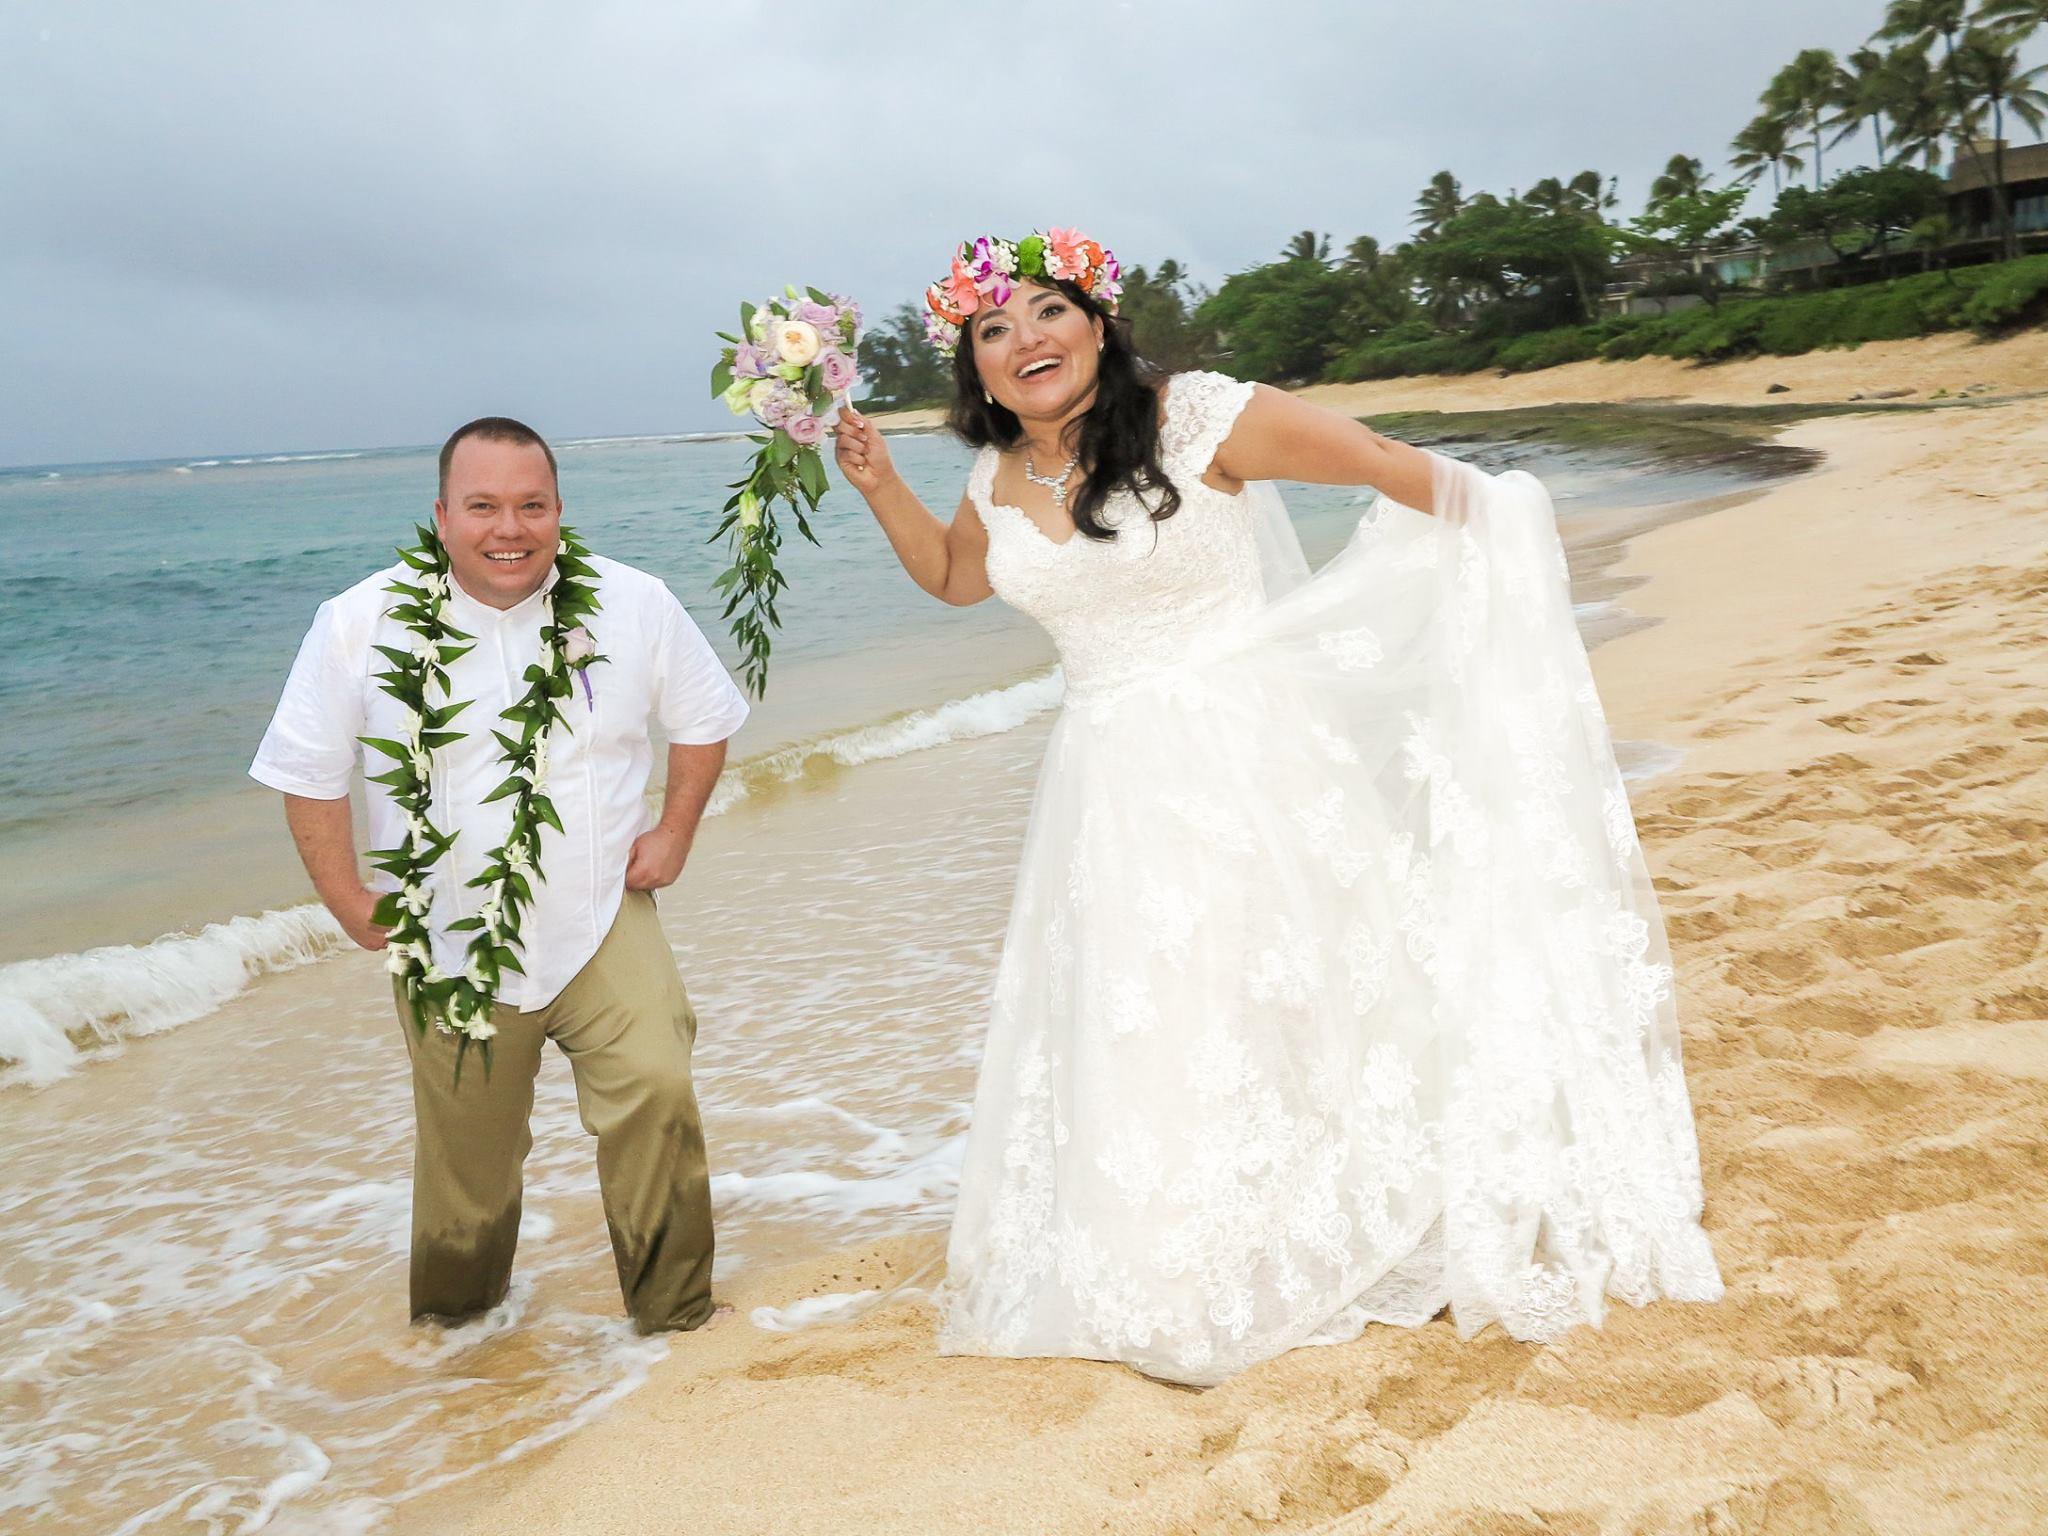 Wedding In Hawaii.Five Tips To Having The Perfect Beach Wedding In Hawaii Hawaii